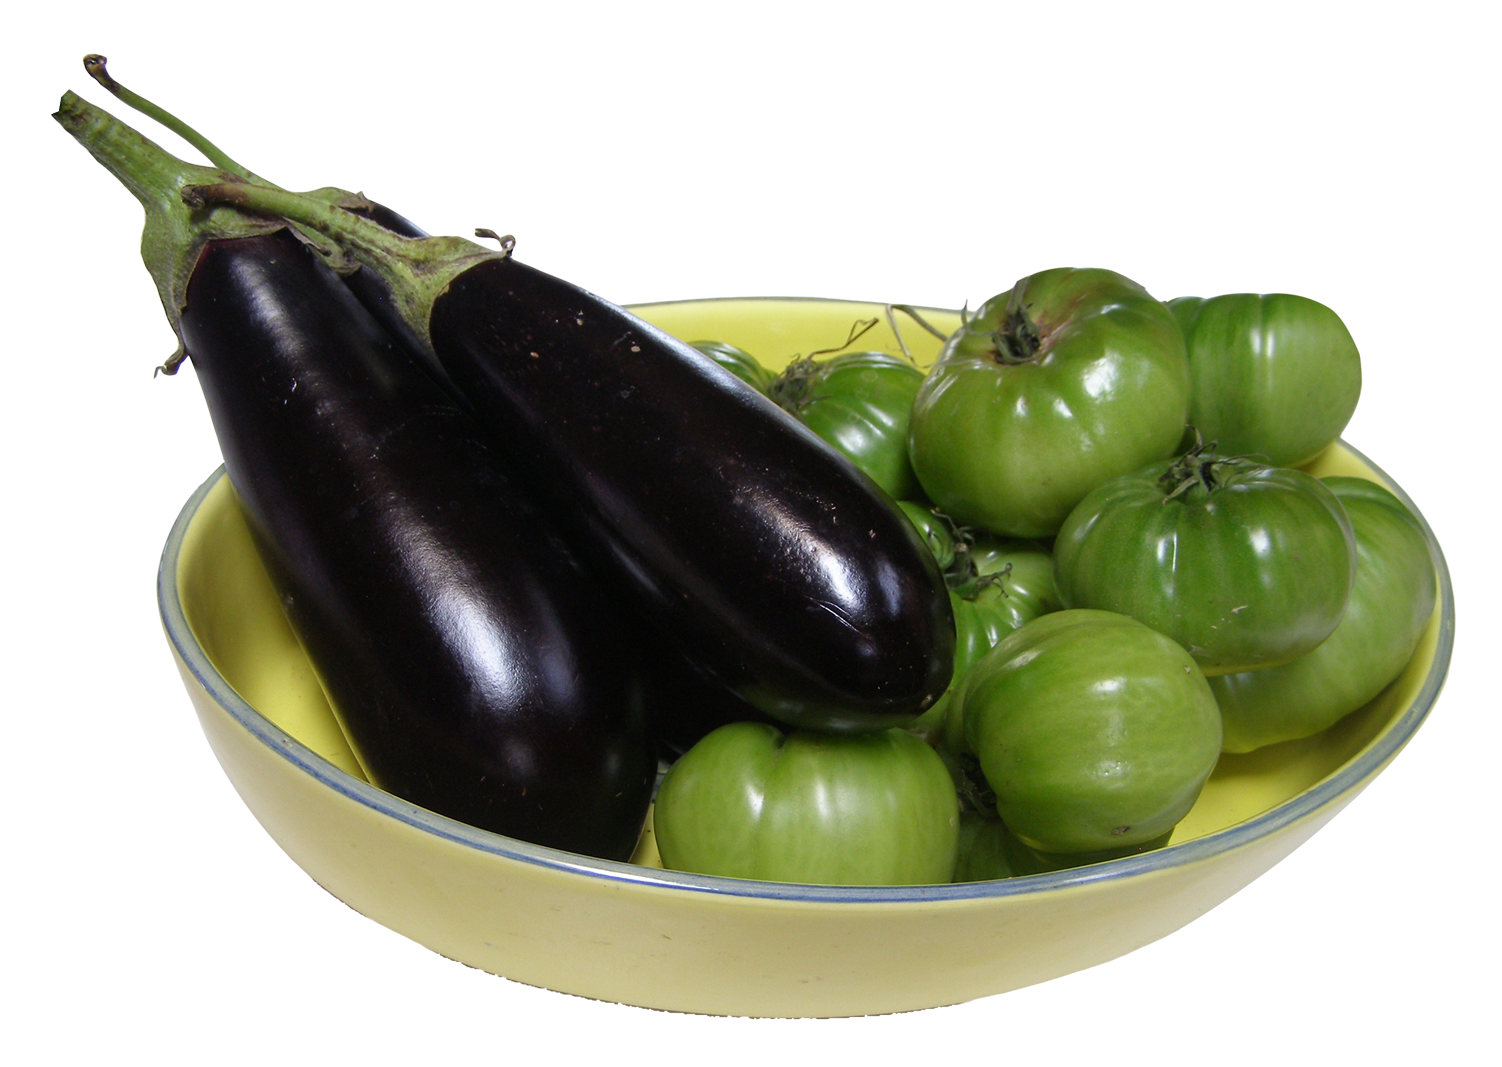 Eggplant Tomato PNG Image